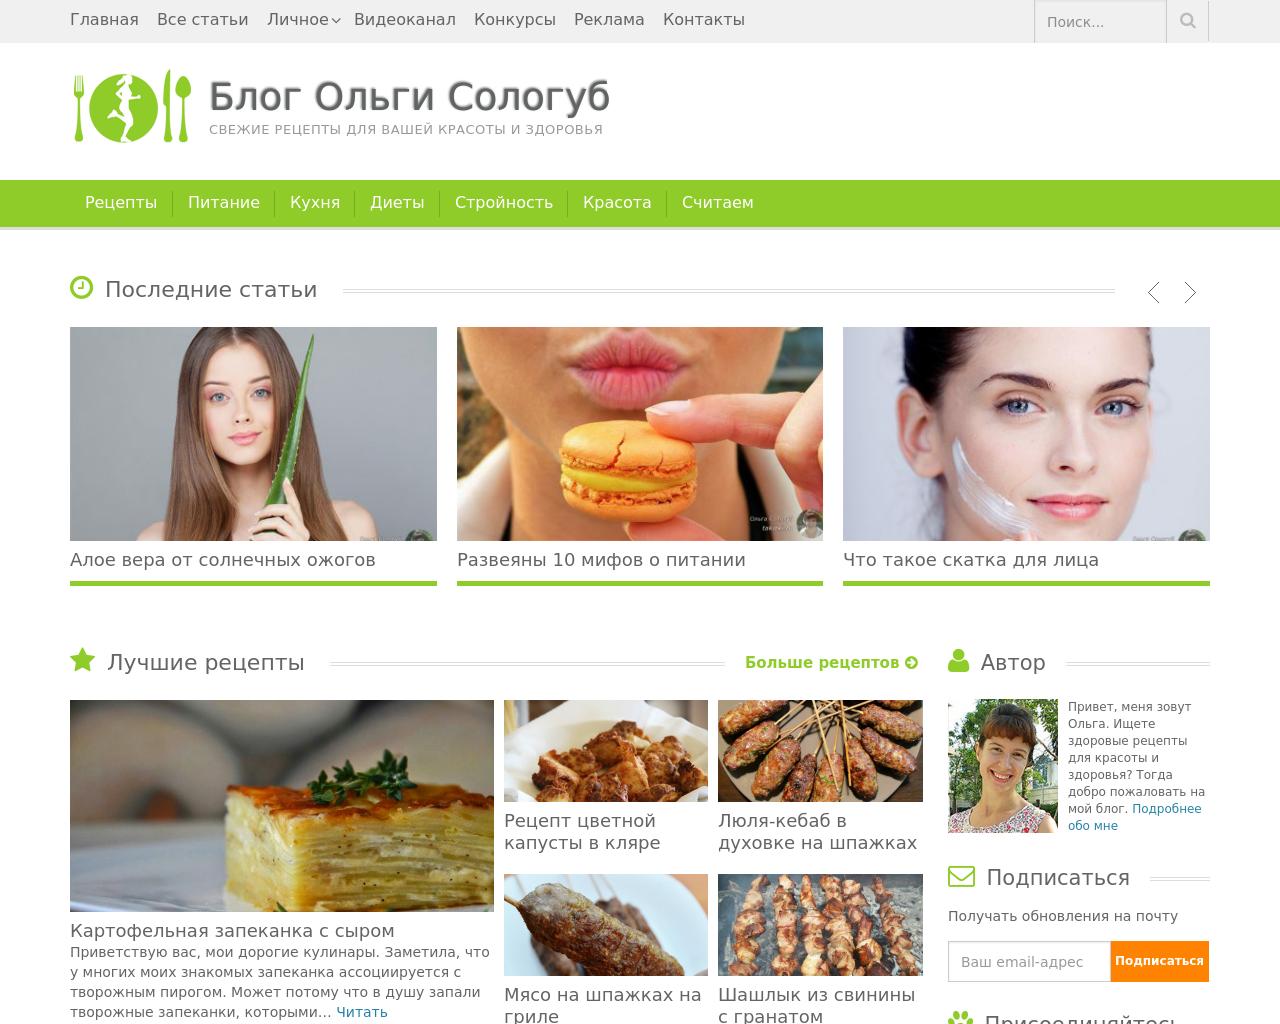 Blog-Olga-Sologub-Advertising-Reviews-Pricing